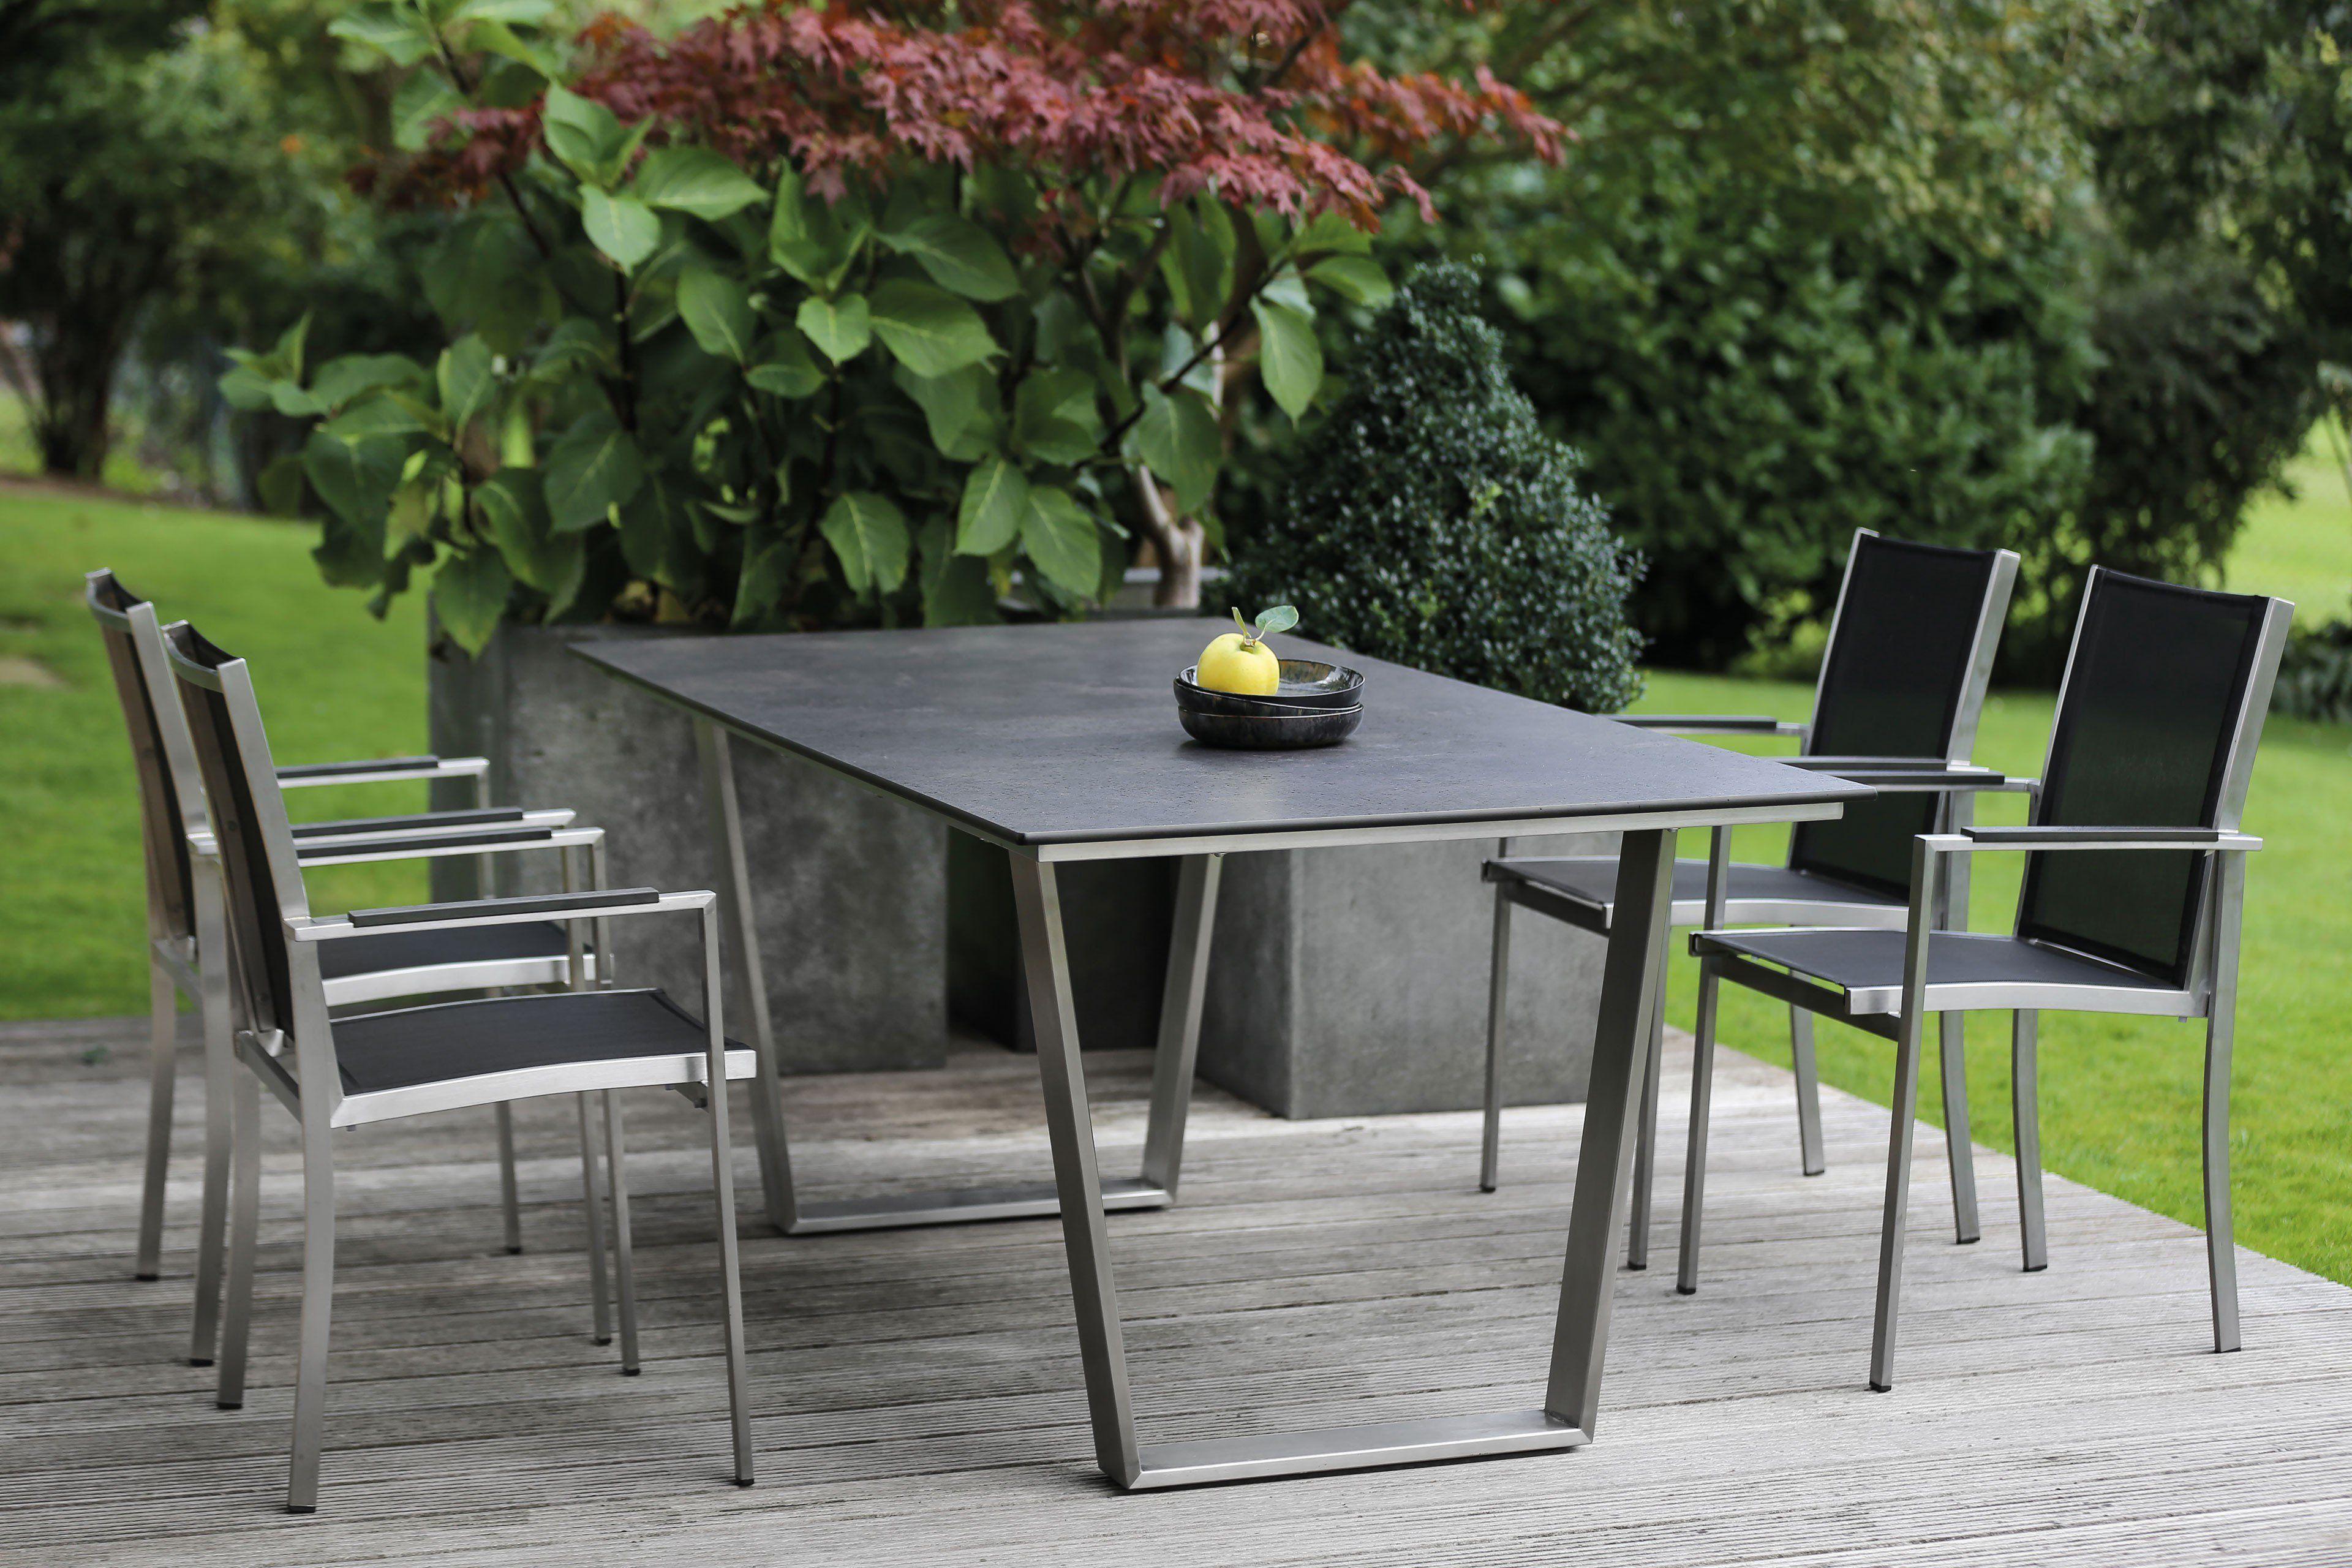 Niehoff Garden Noah Gartentisch Mobel Letz Ihr Online Shop Gartentisch Gartenmobel Sets Aussenmobel